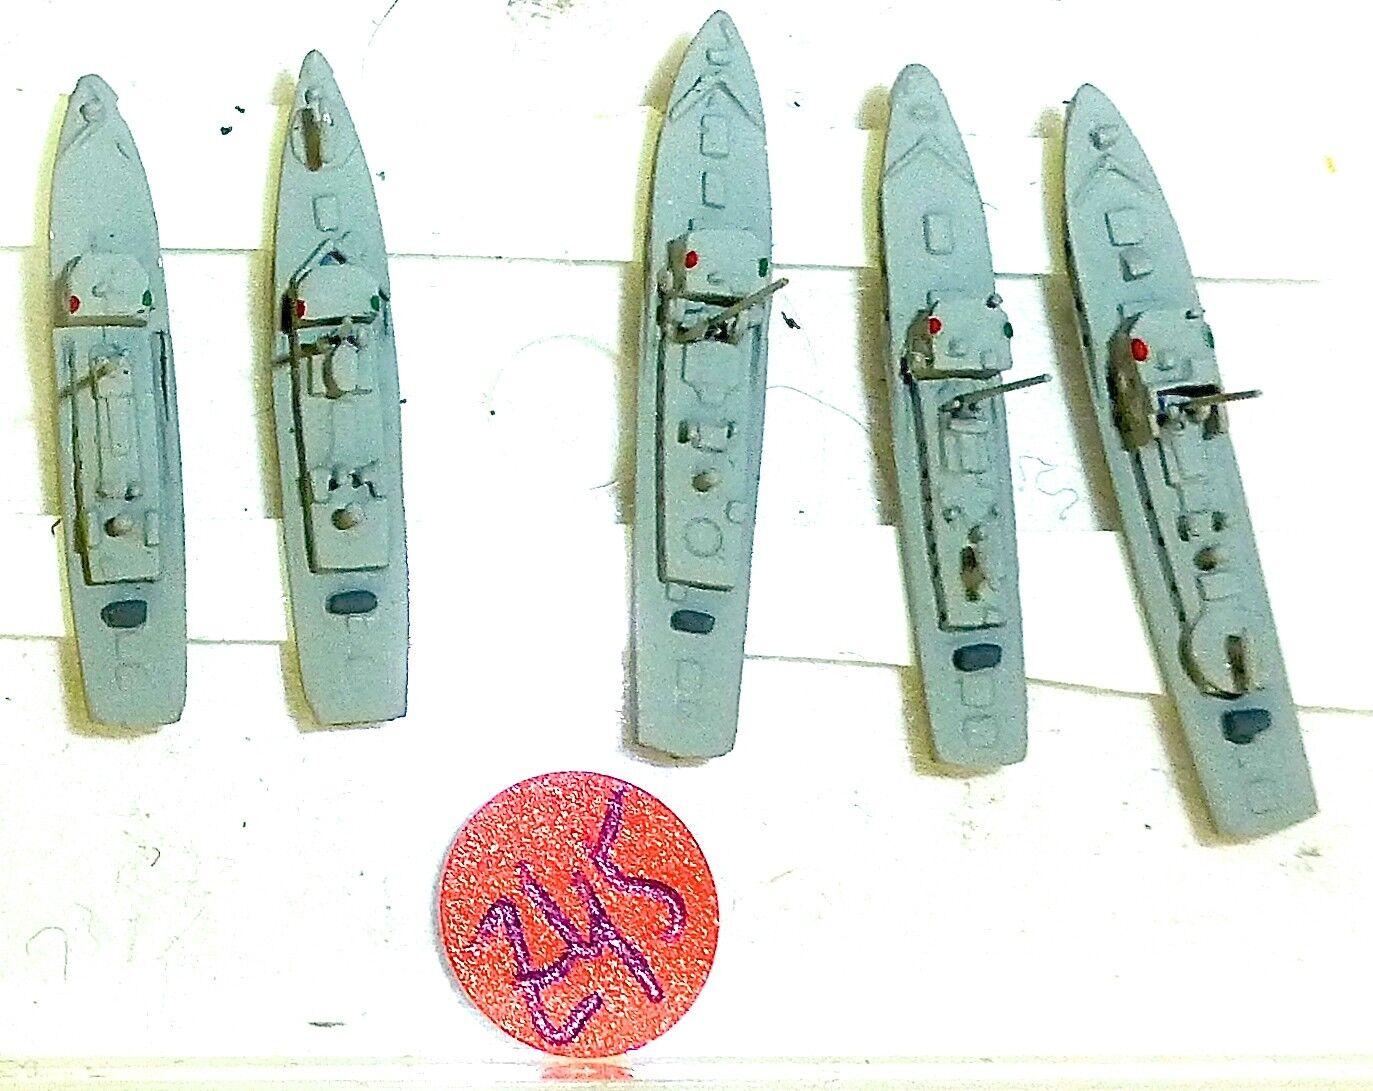 5 pcs R1M R2KM r3km r8km R9KM Ship Model 1 1250 shpz45 Å